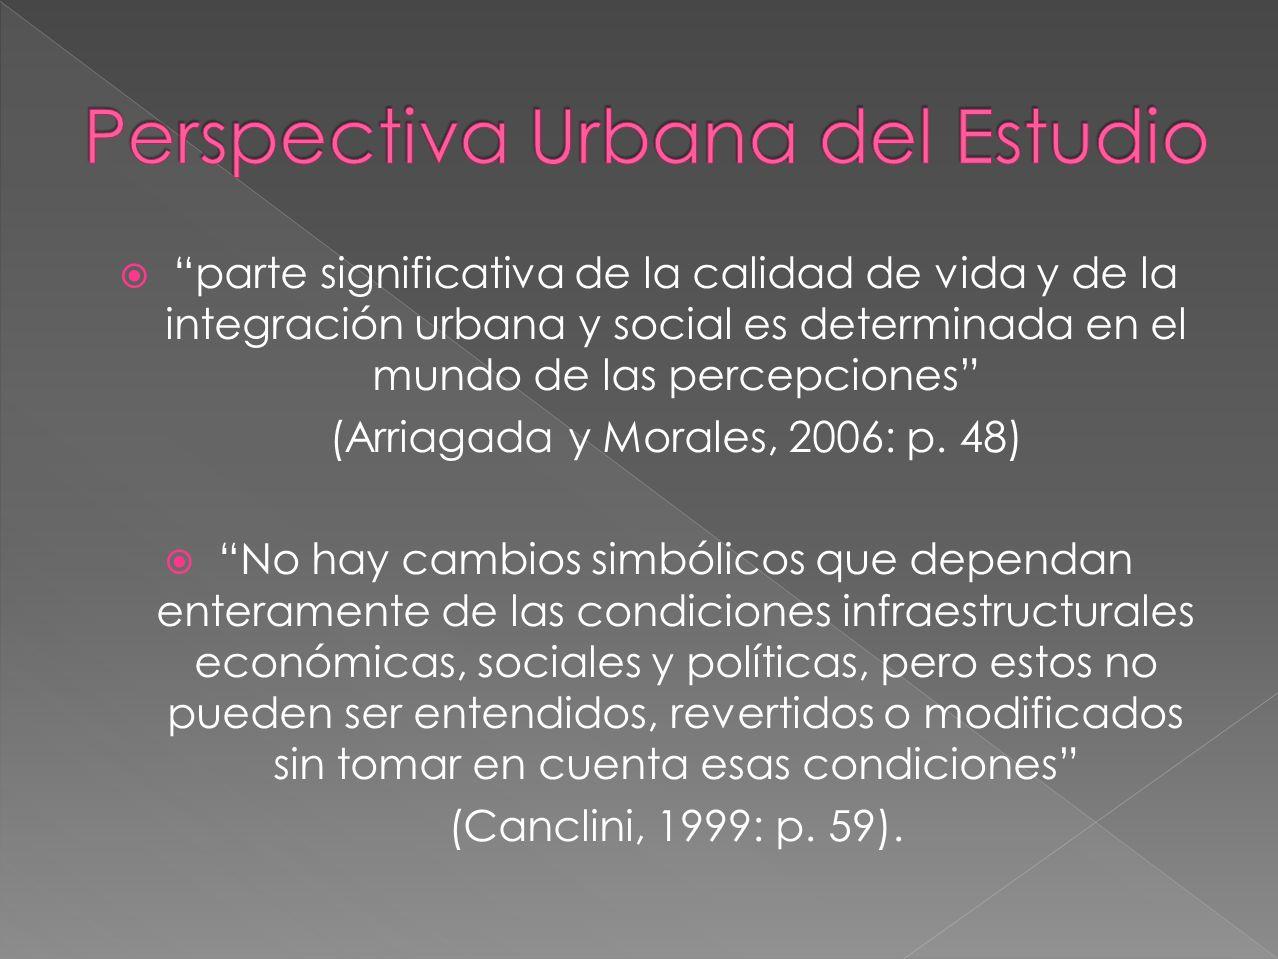 Perspectiva Urbana del Estudio